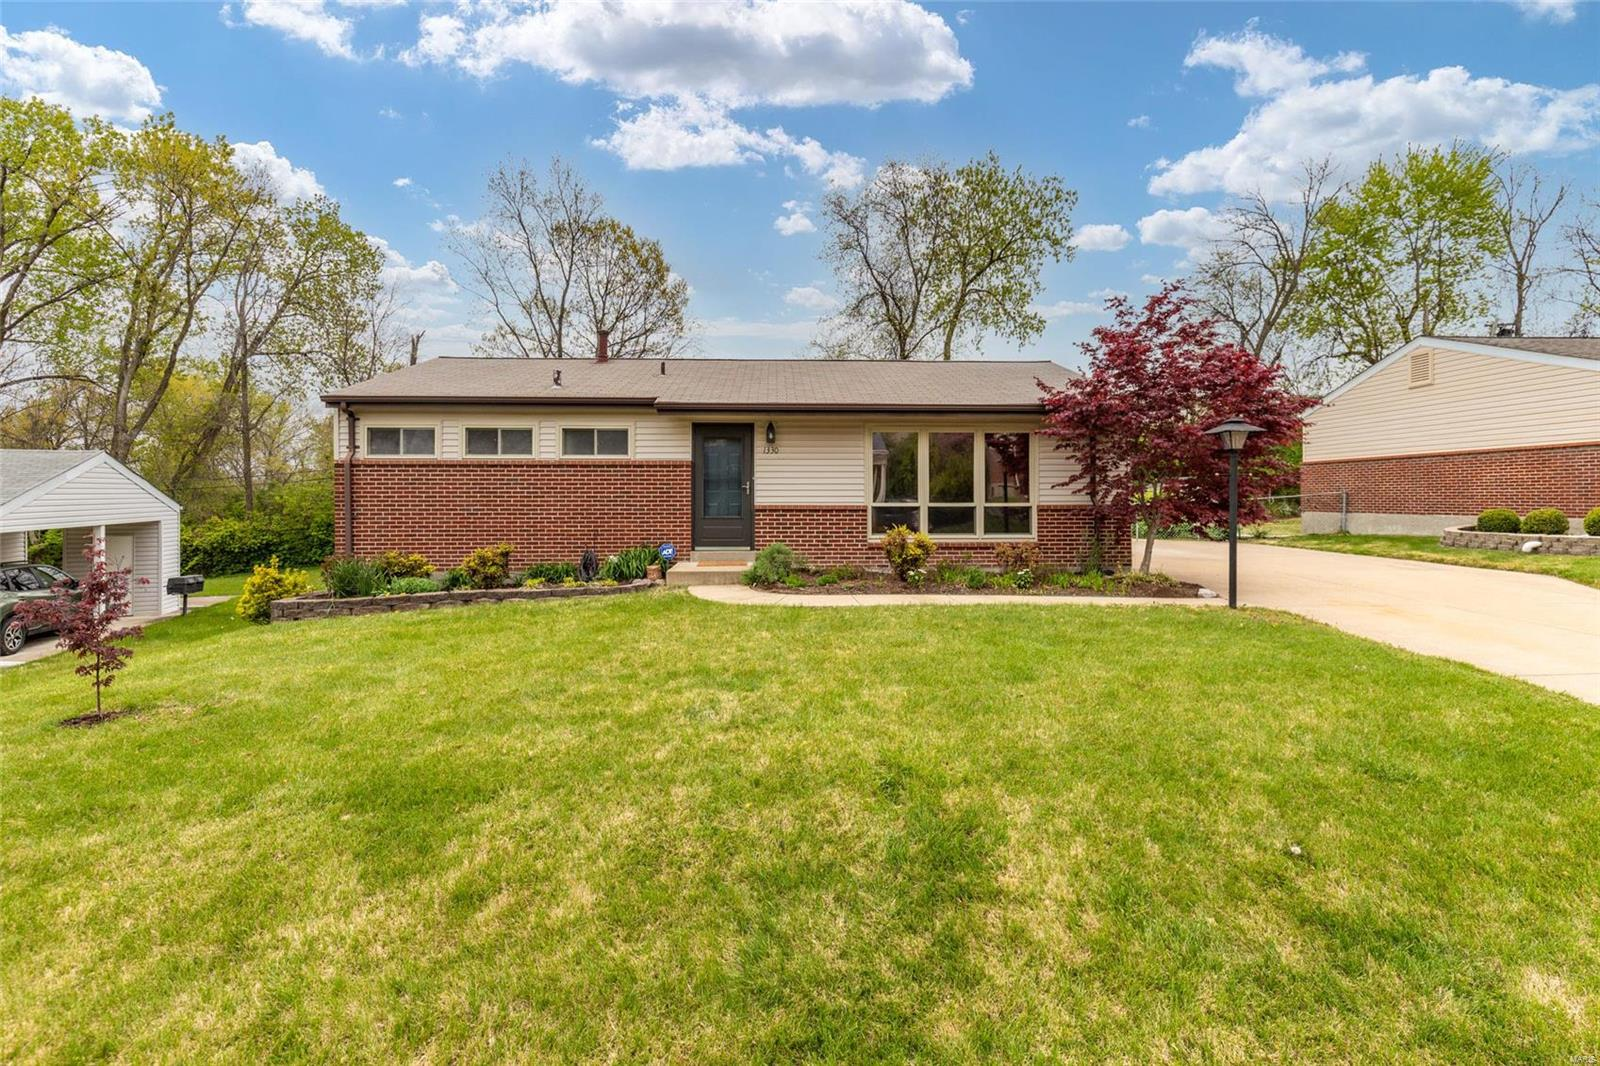 1330 Arrowhead Drive Property Photo - Olivette, MO real estate listing